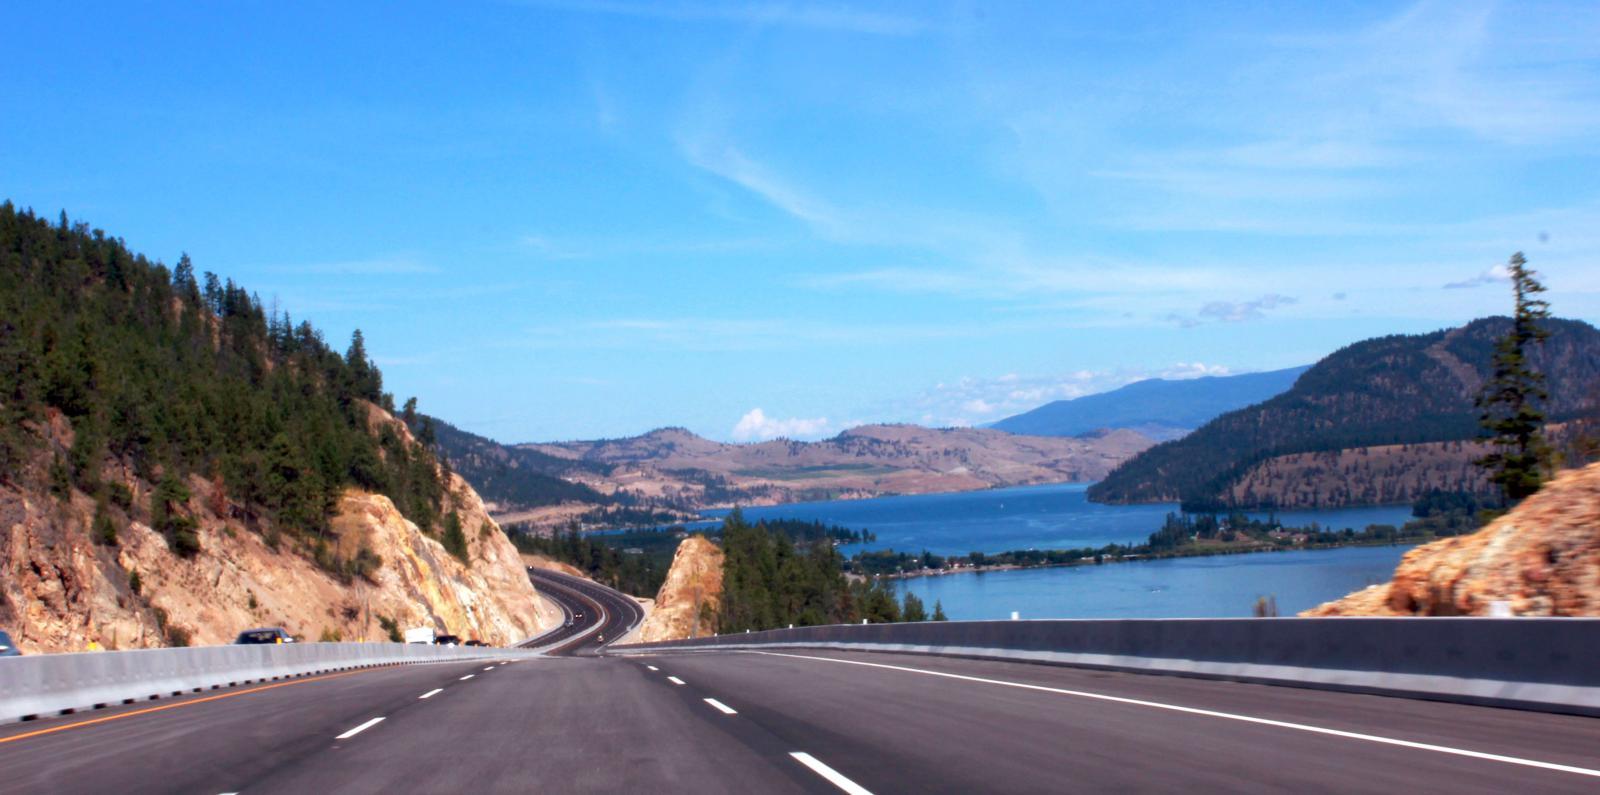 Central Okanagan's First Region-Wide Transportation Plan Ready for Endorsement